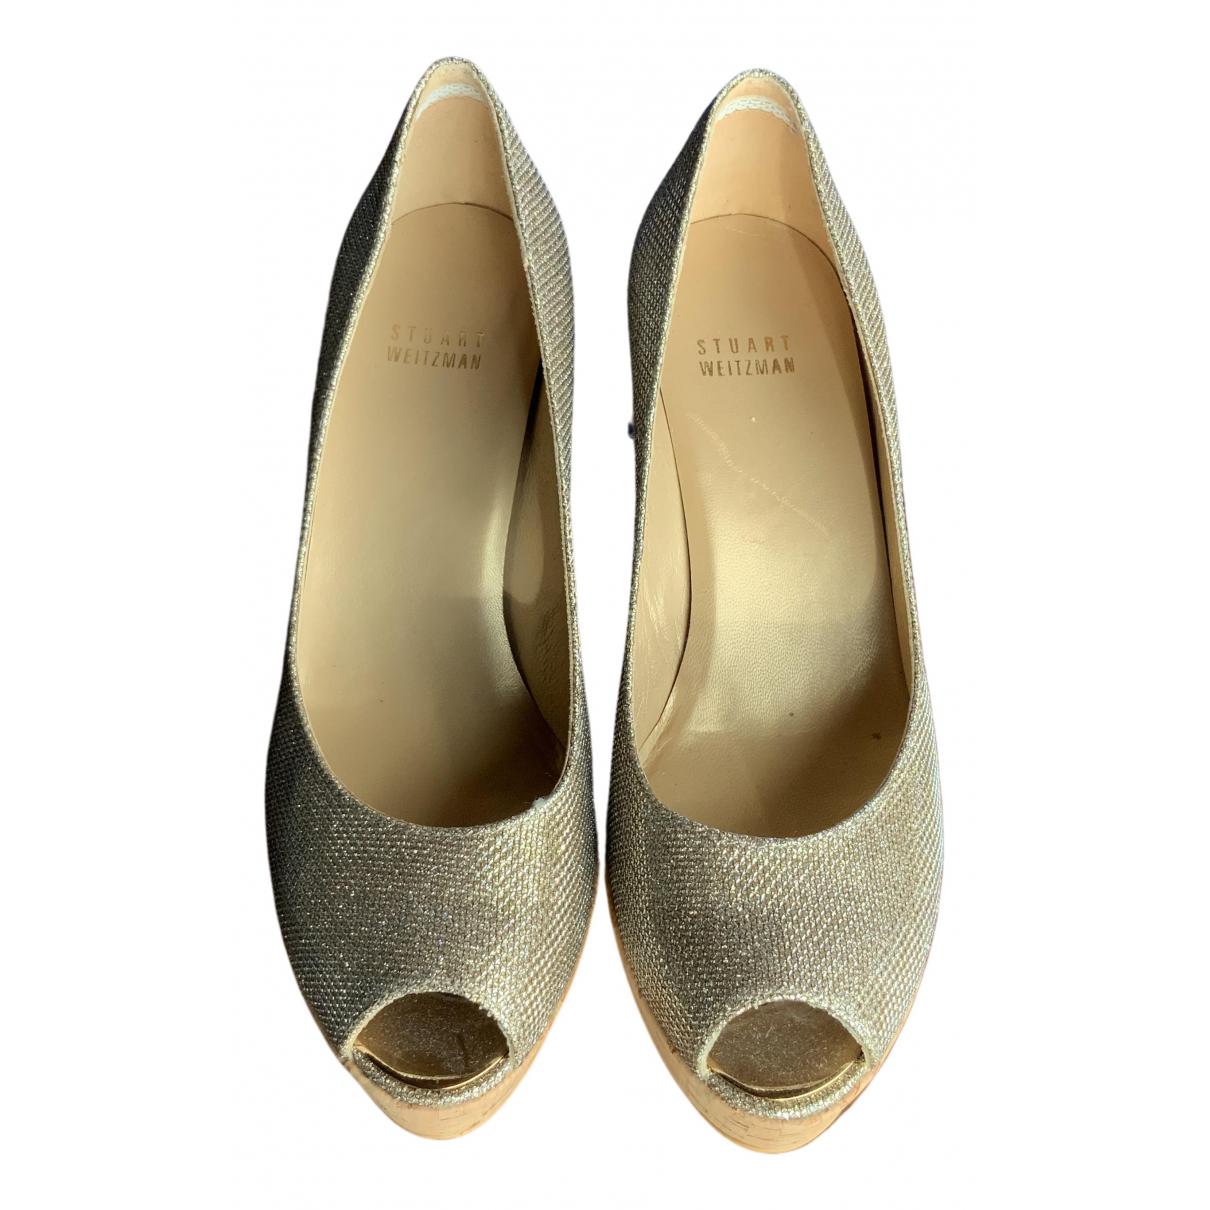 Stuart Weitzman \N Grey Leather Heels for Women 38 IT